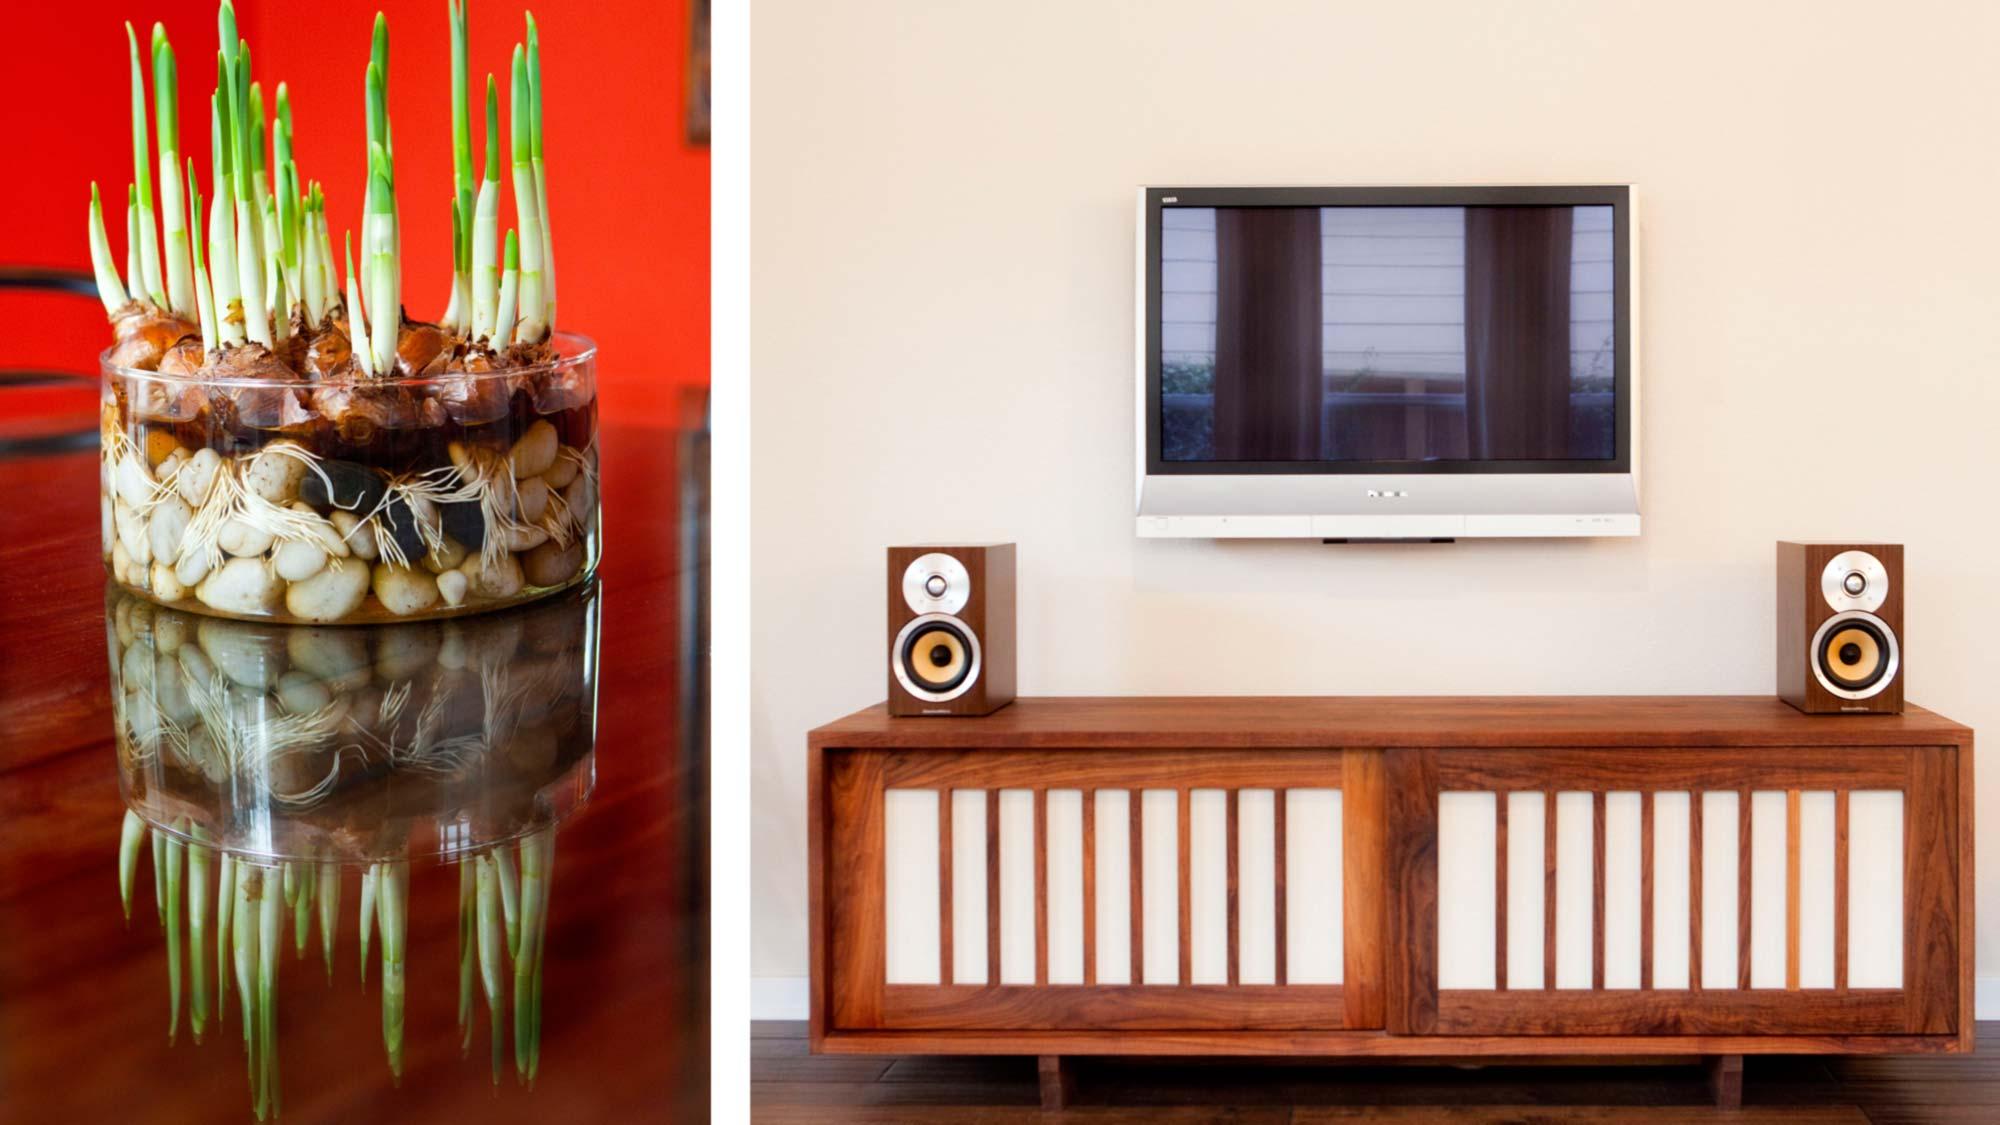 Kris-Swift-Home-3-composite